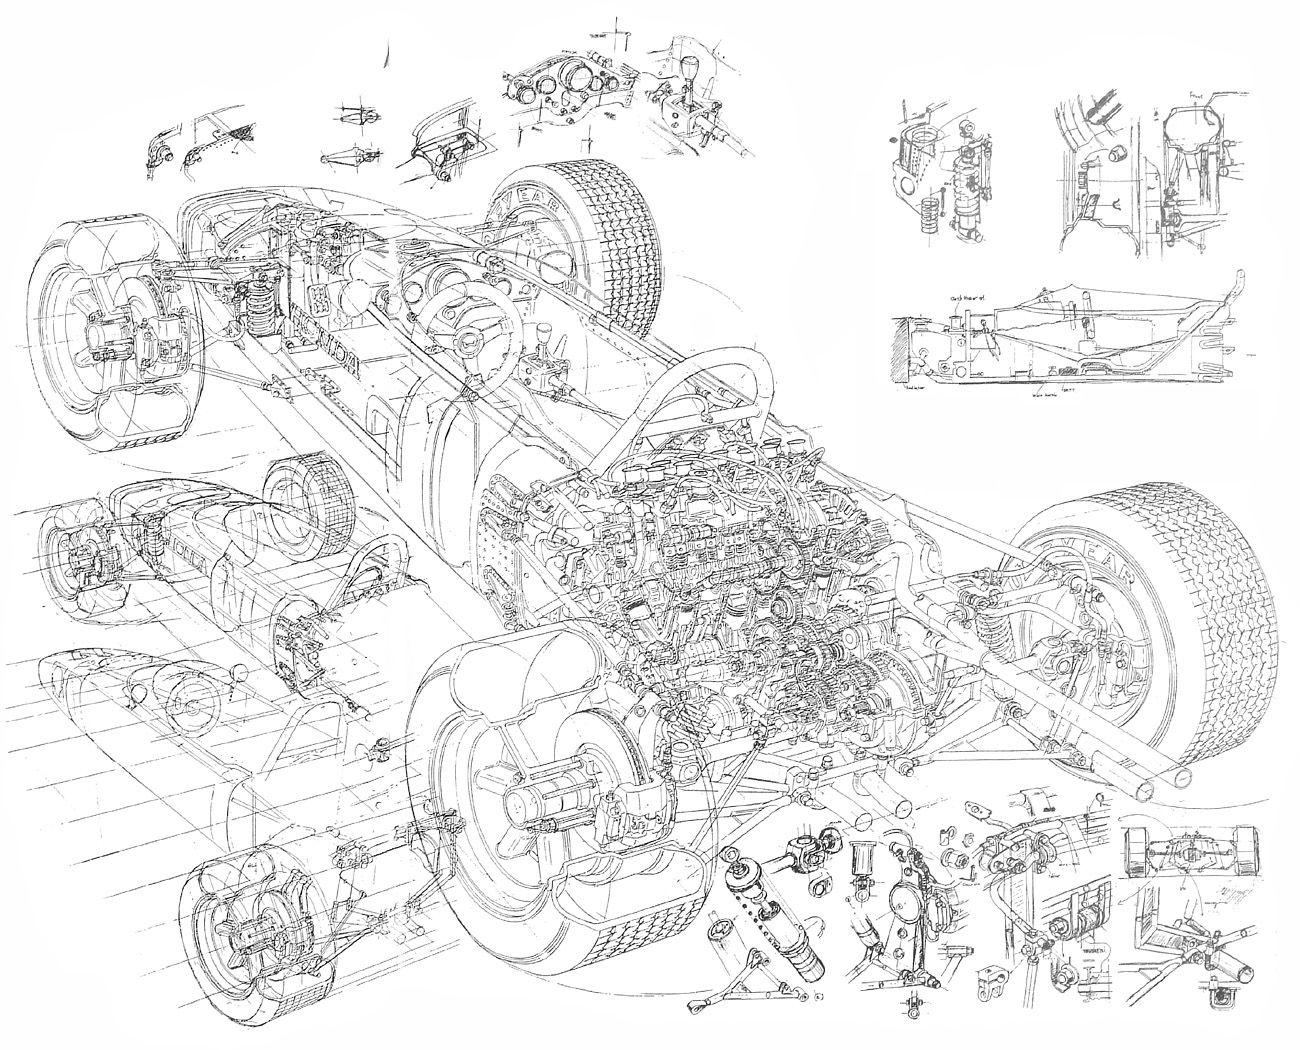 Honda Ra272 Formula 1 Line Construction Artwork For Cutaway By Yoshiro Inomoto